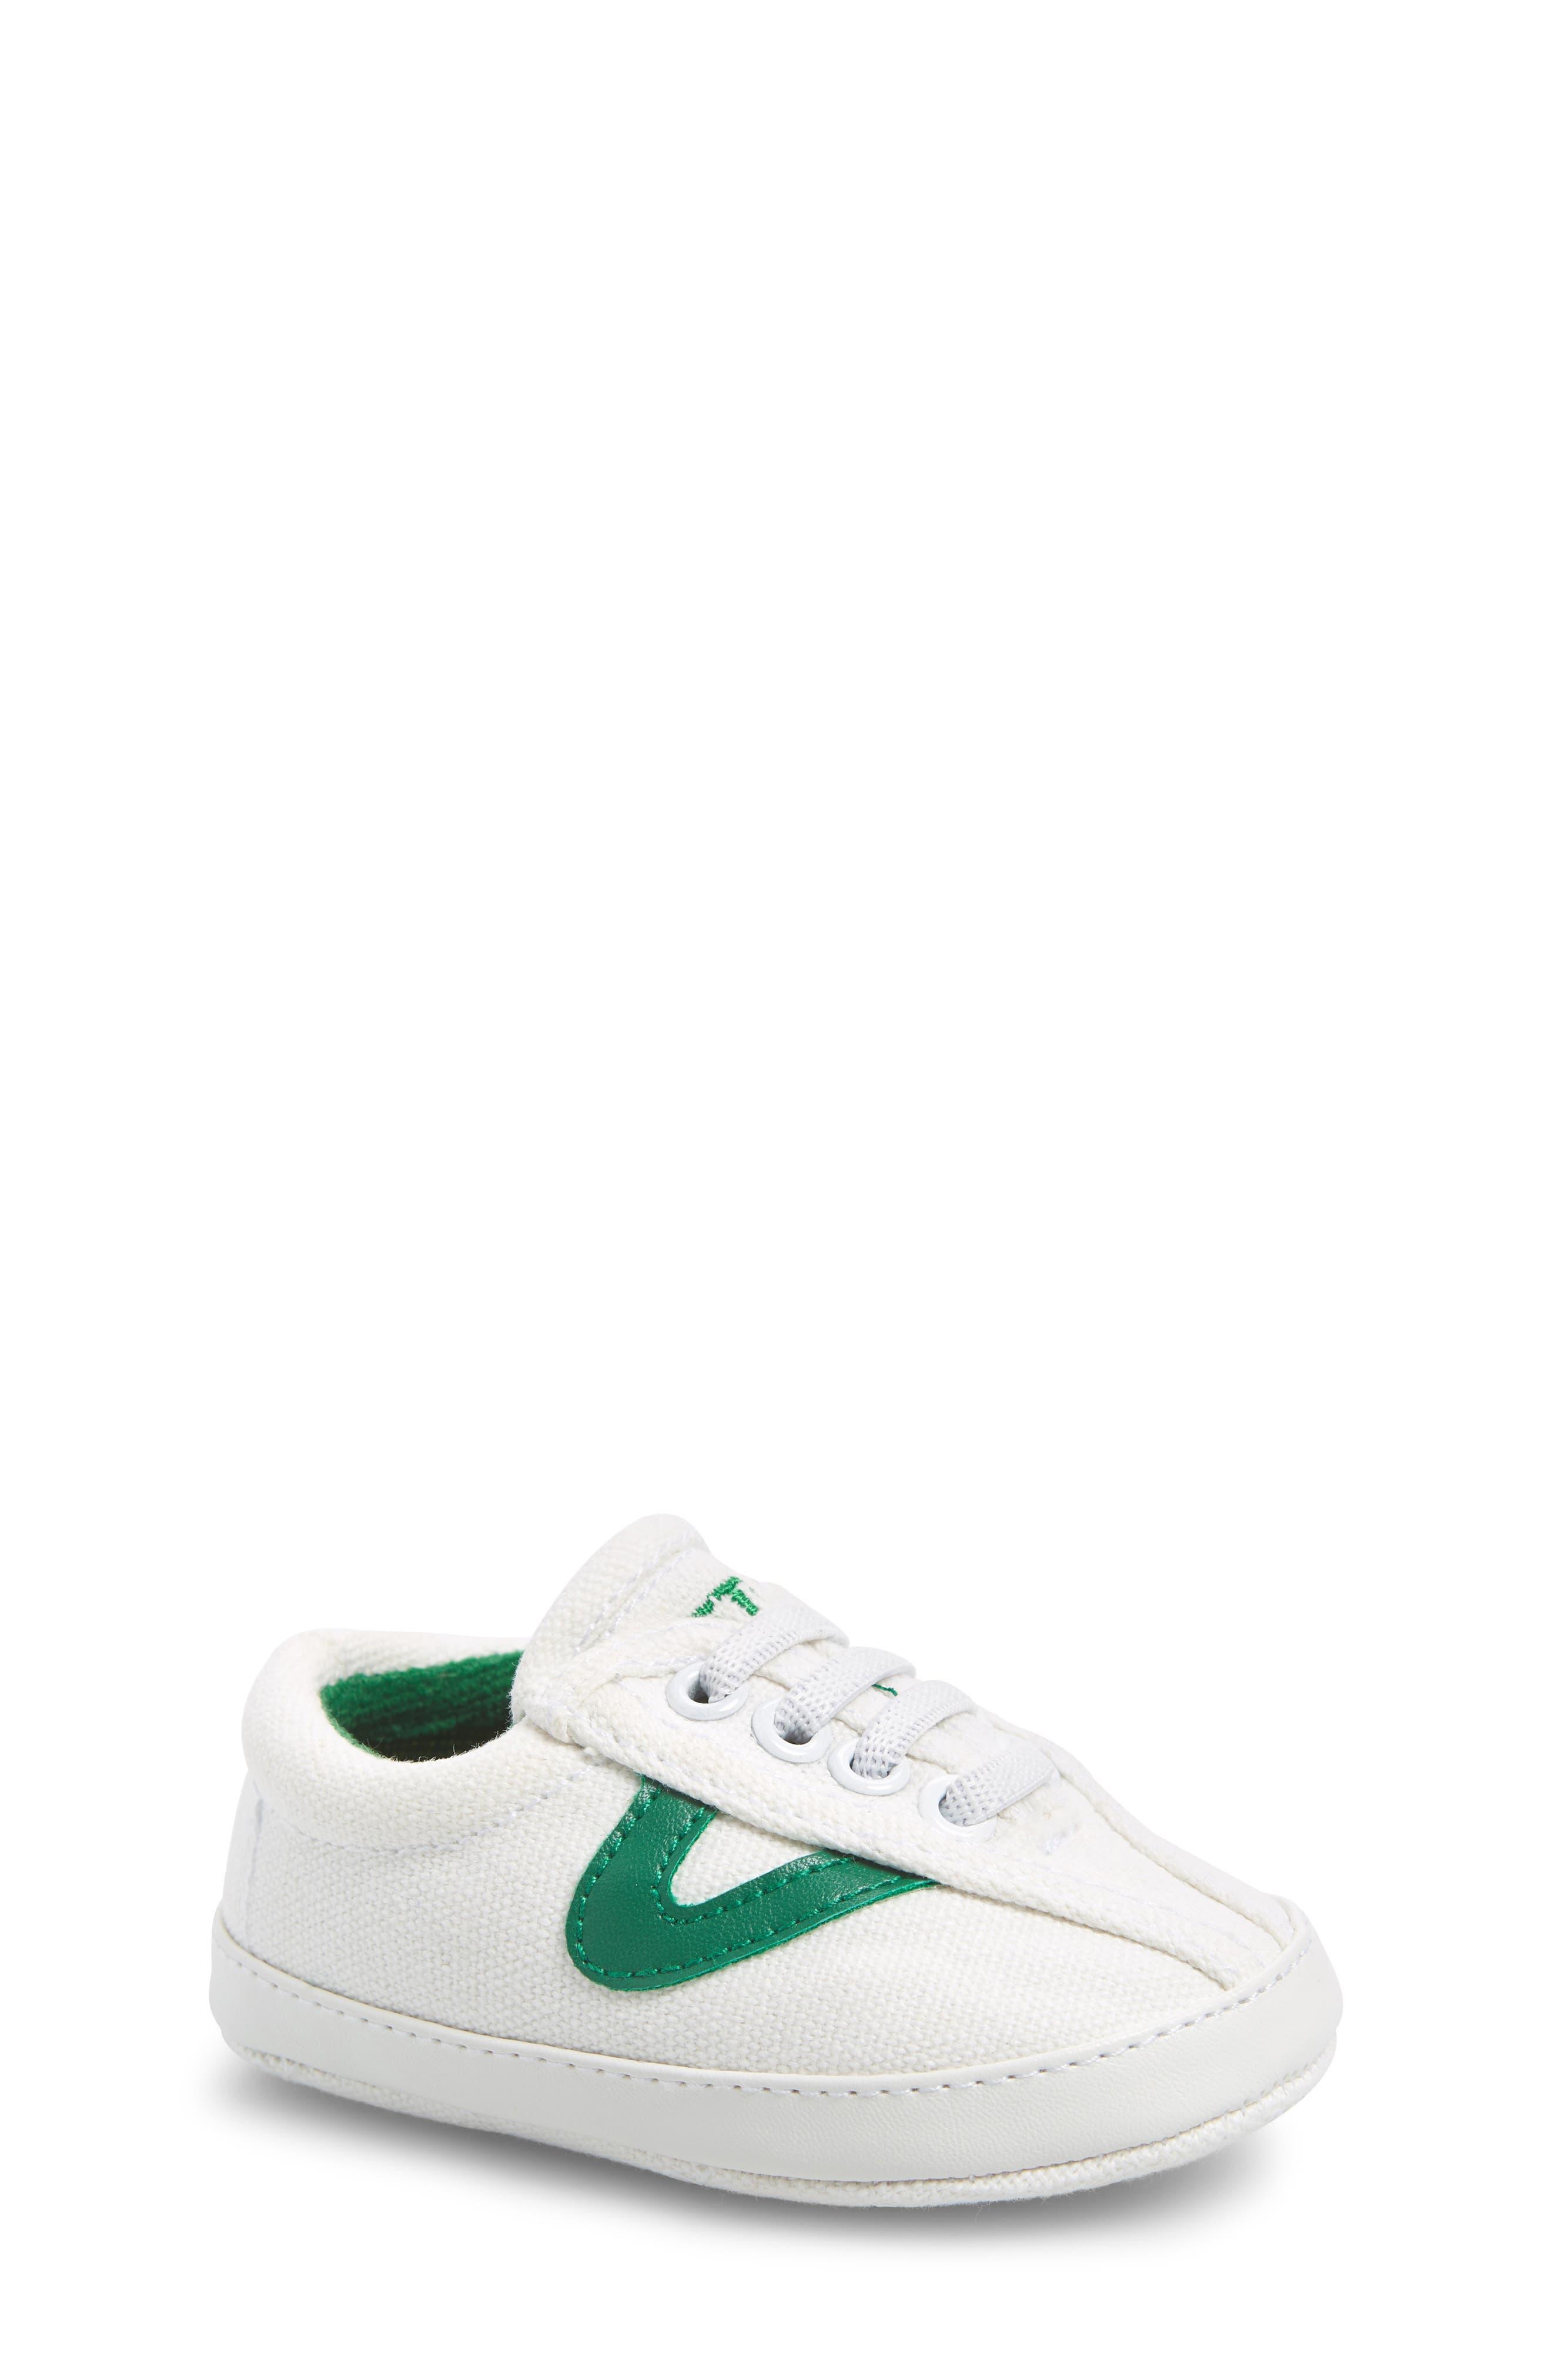 Tretorn Nylite Plus Sneaker (Baby)